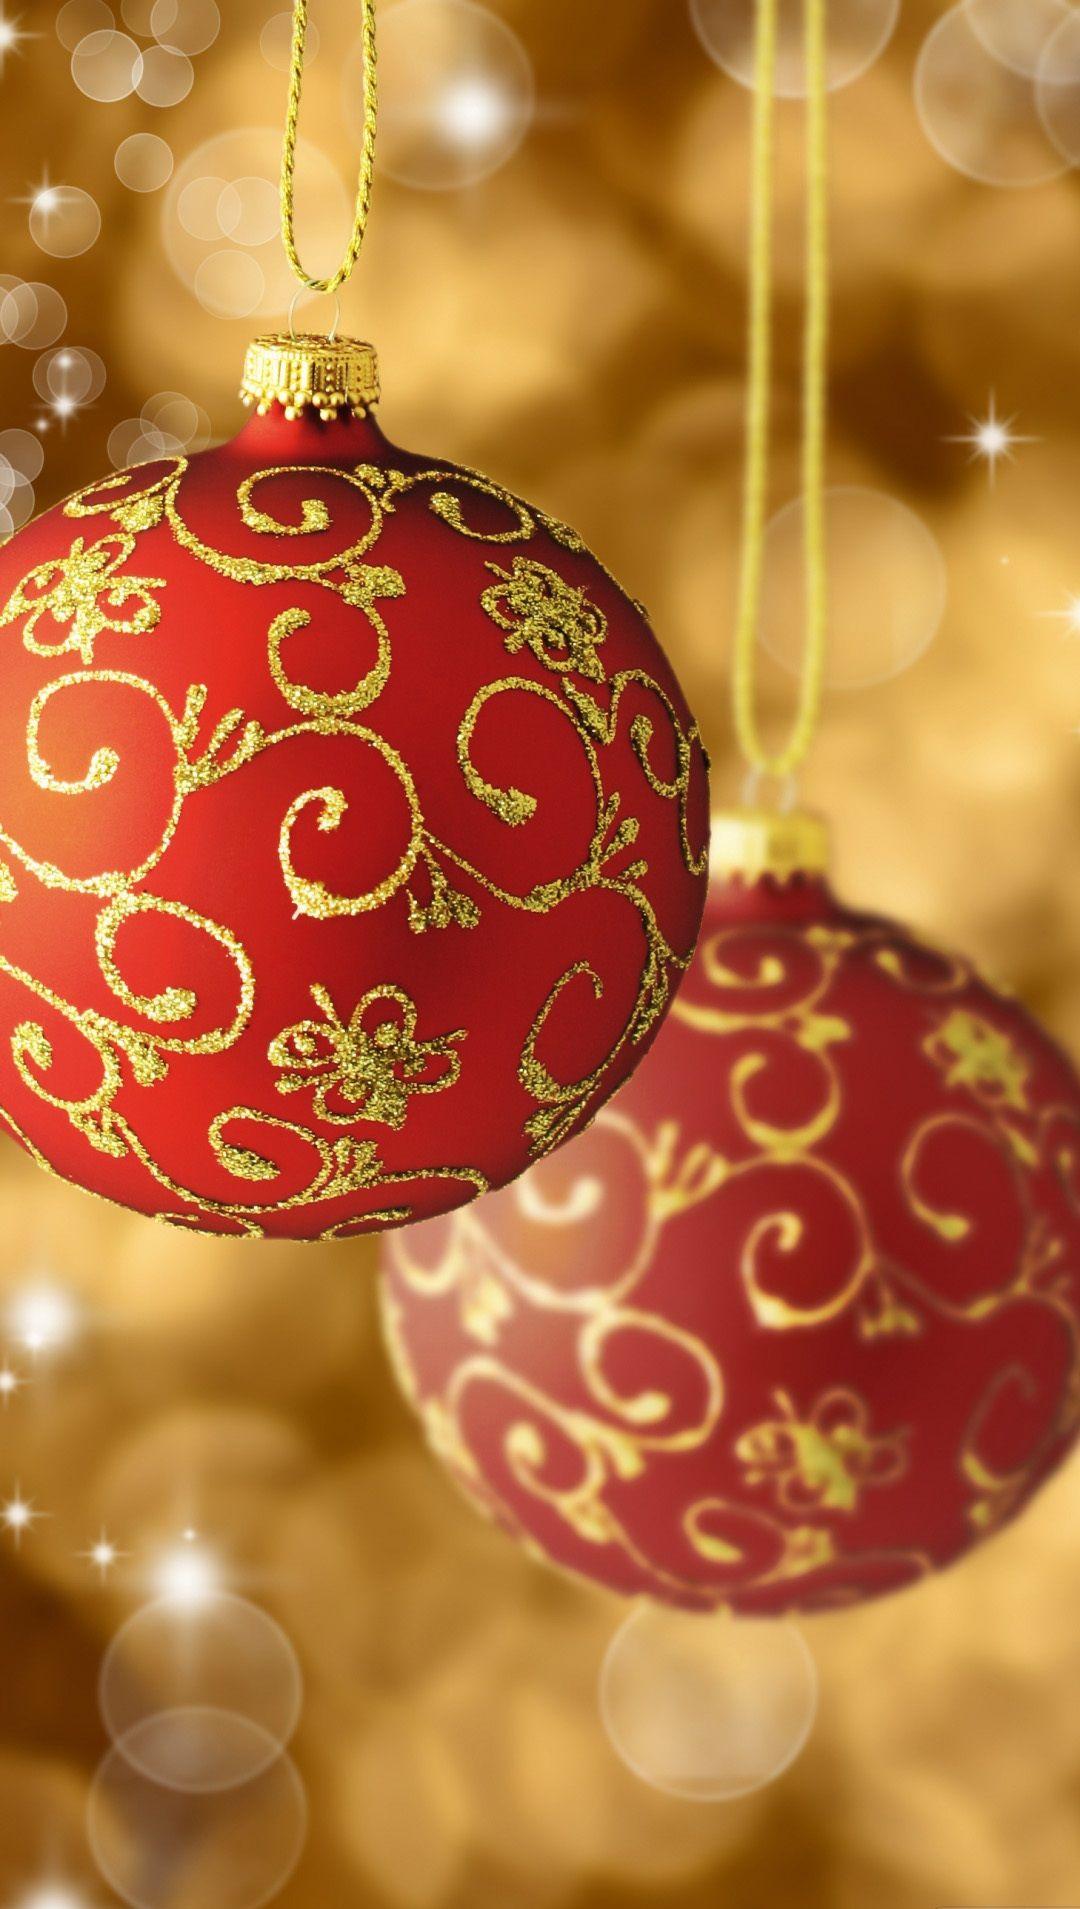 Christmas Holidays Lock Screen 1080x1920 Samsung Galaxy Note 3 Wallpaper Red Gold Christmas Christmas Live Wallpaper Gold Christmas Tree Decorations